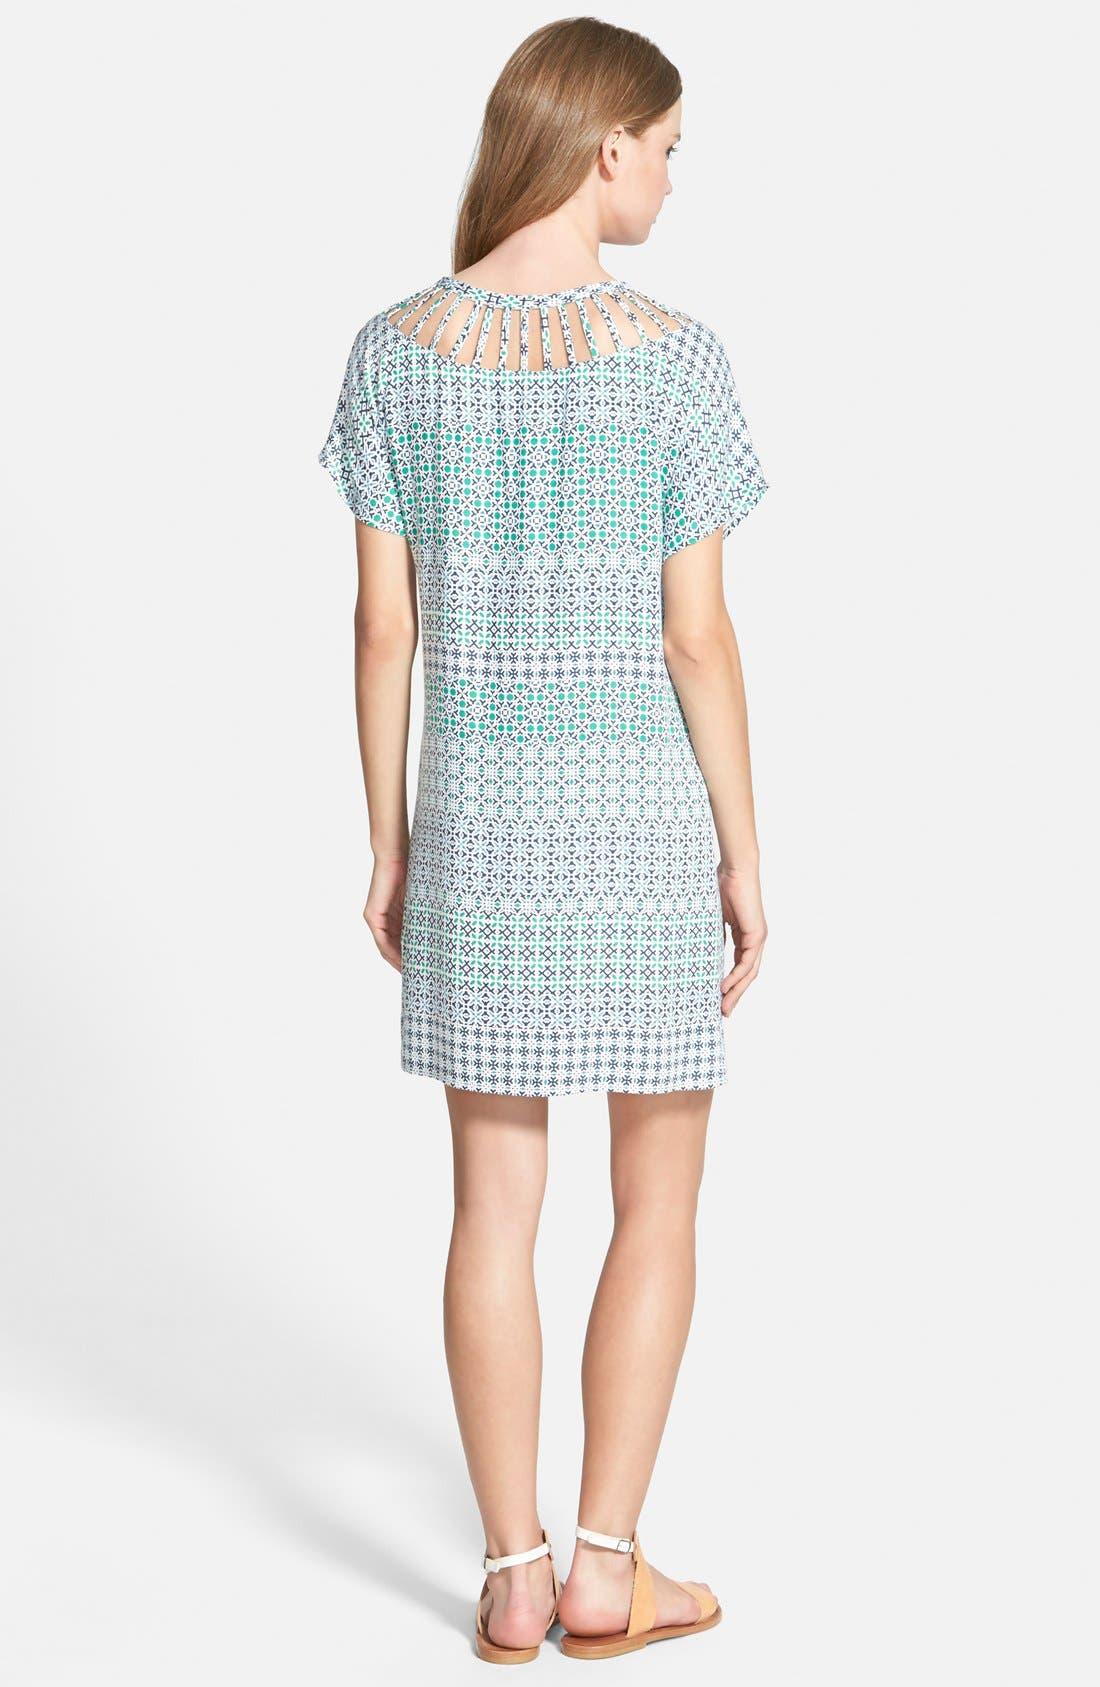 ELLA MOSS,                             'Mozaic' Short Sleeve Shift Dress,                             Alternate thumbnail 3, color,                             300